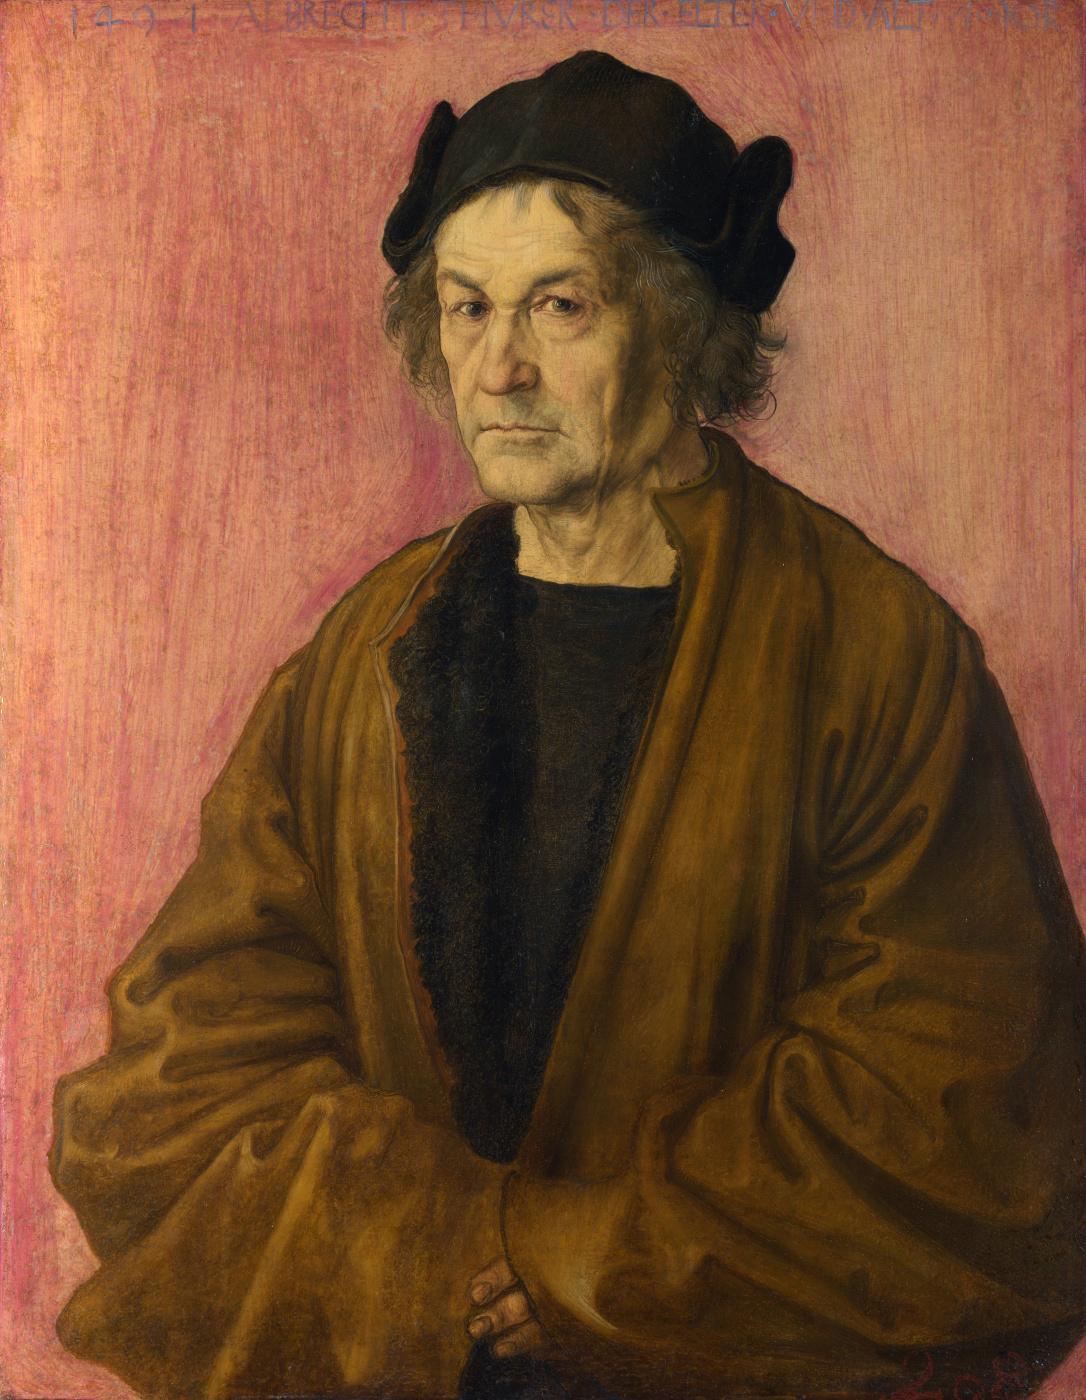 Albrecht Dürer. Portrait of Albrecht dürer the Elder in the age of 70 years